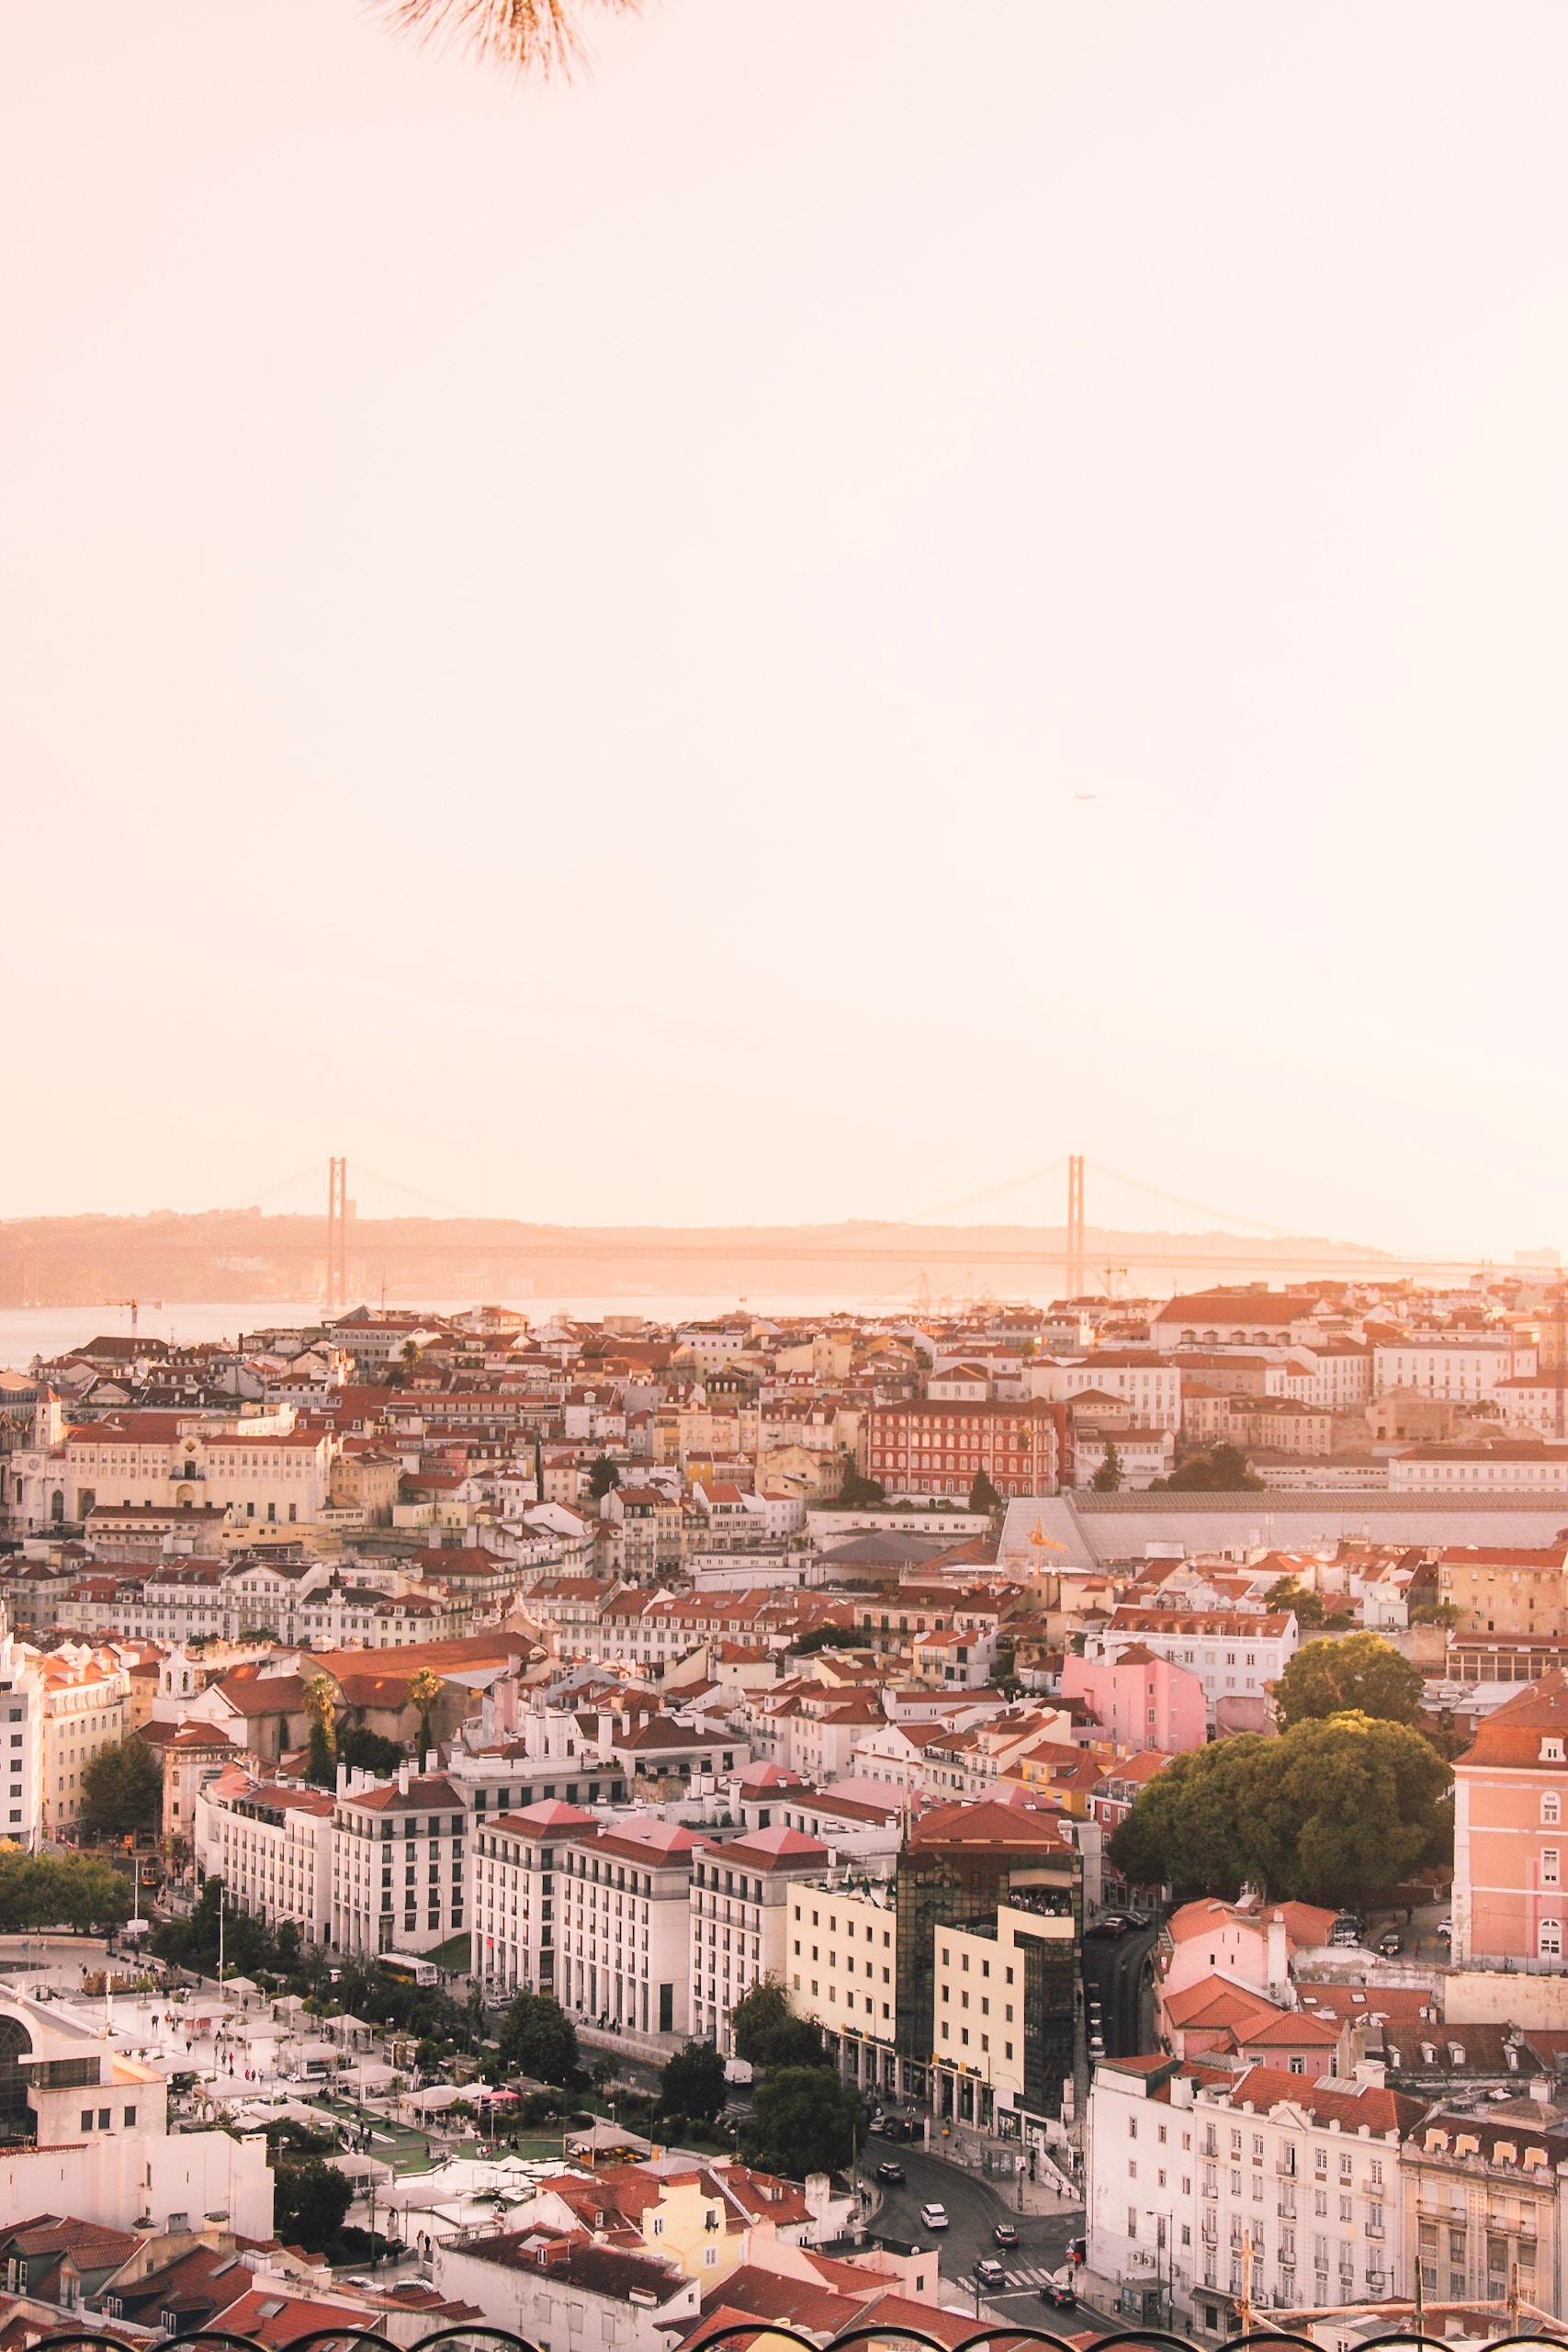 Lisbons view - john-jason.jpg